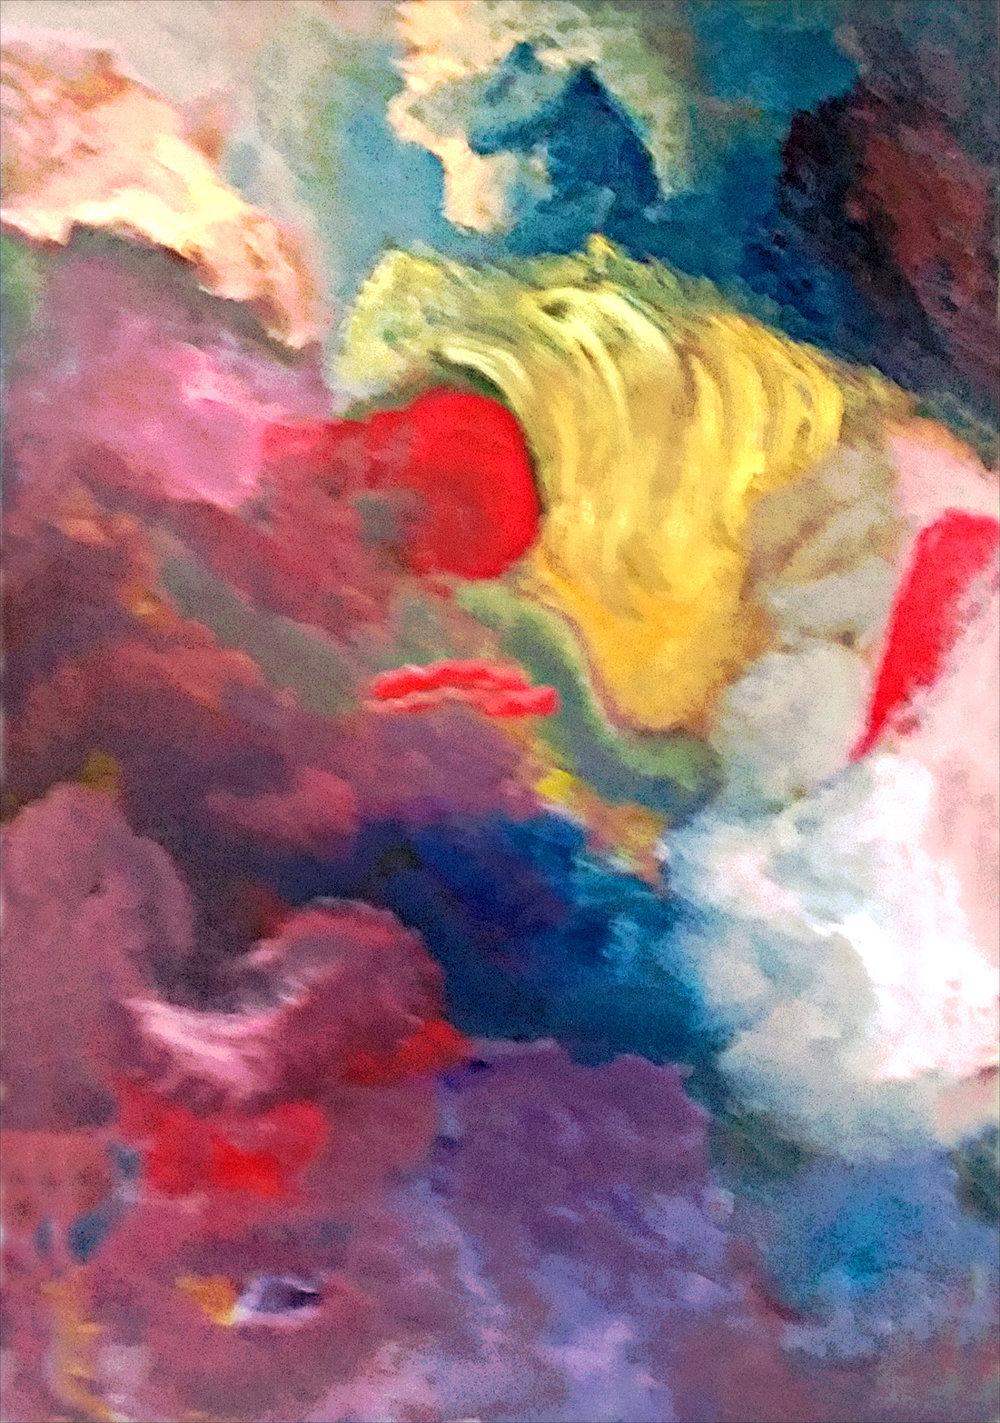 Angelo Oil on Canvas 24x36 (05/2018) $800